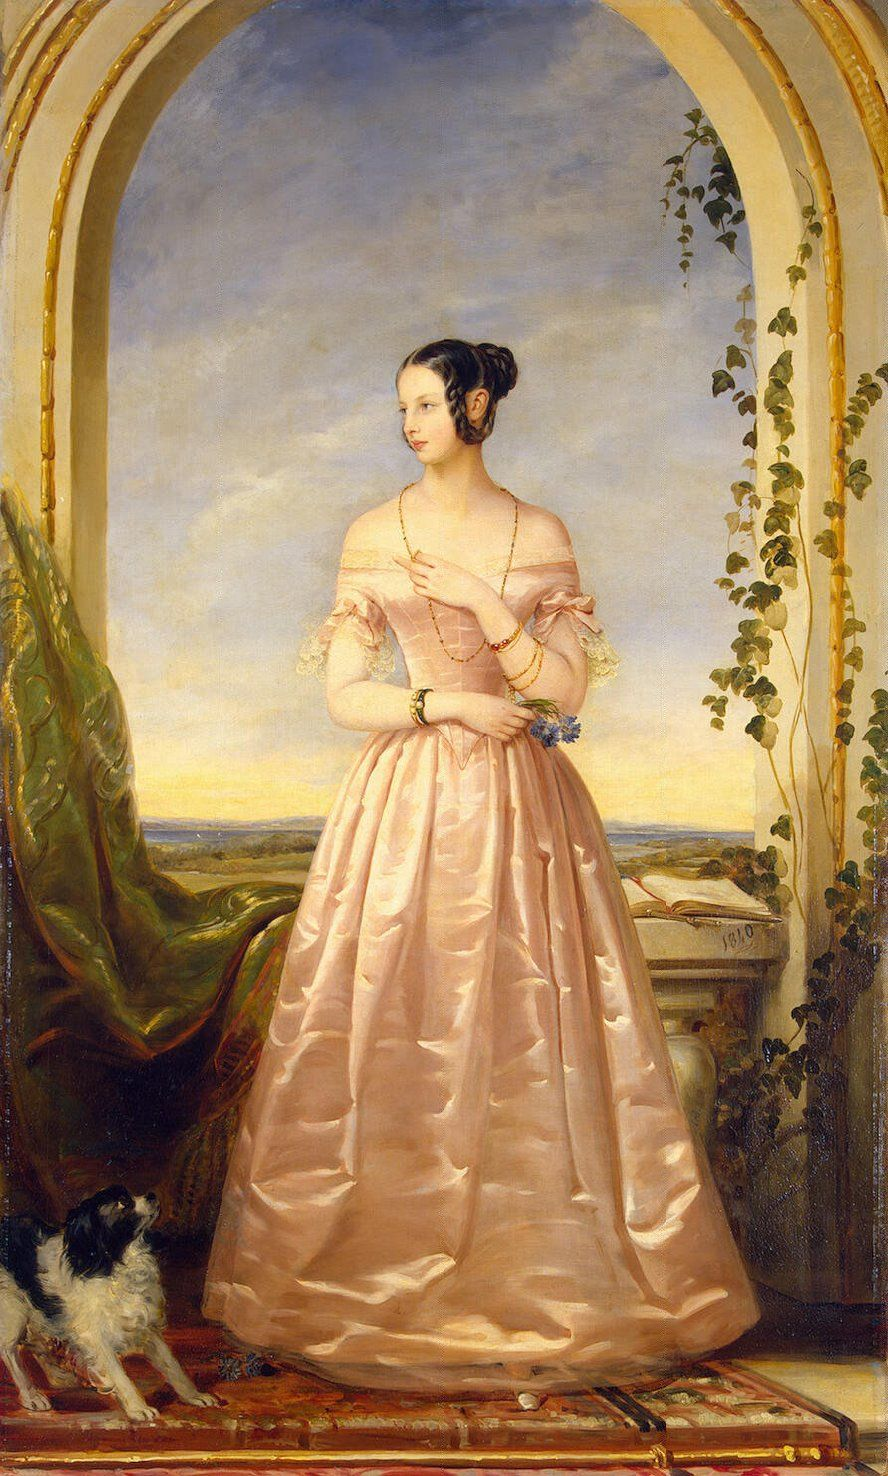 Grand Duchess Alexandra Nikolaevna (1825 – 1844), daughter of Emperor Nicholas I